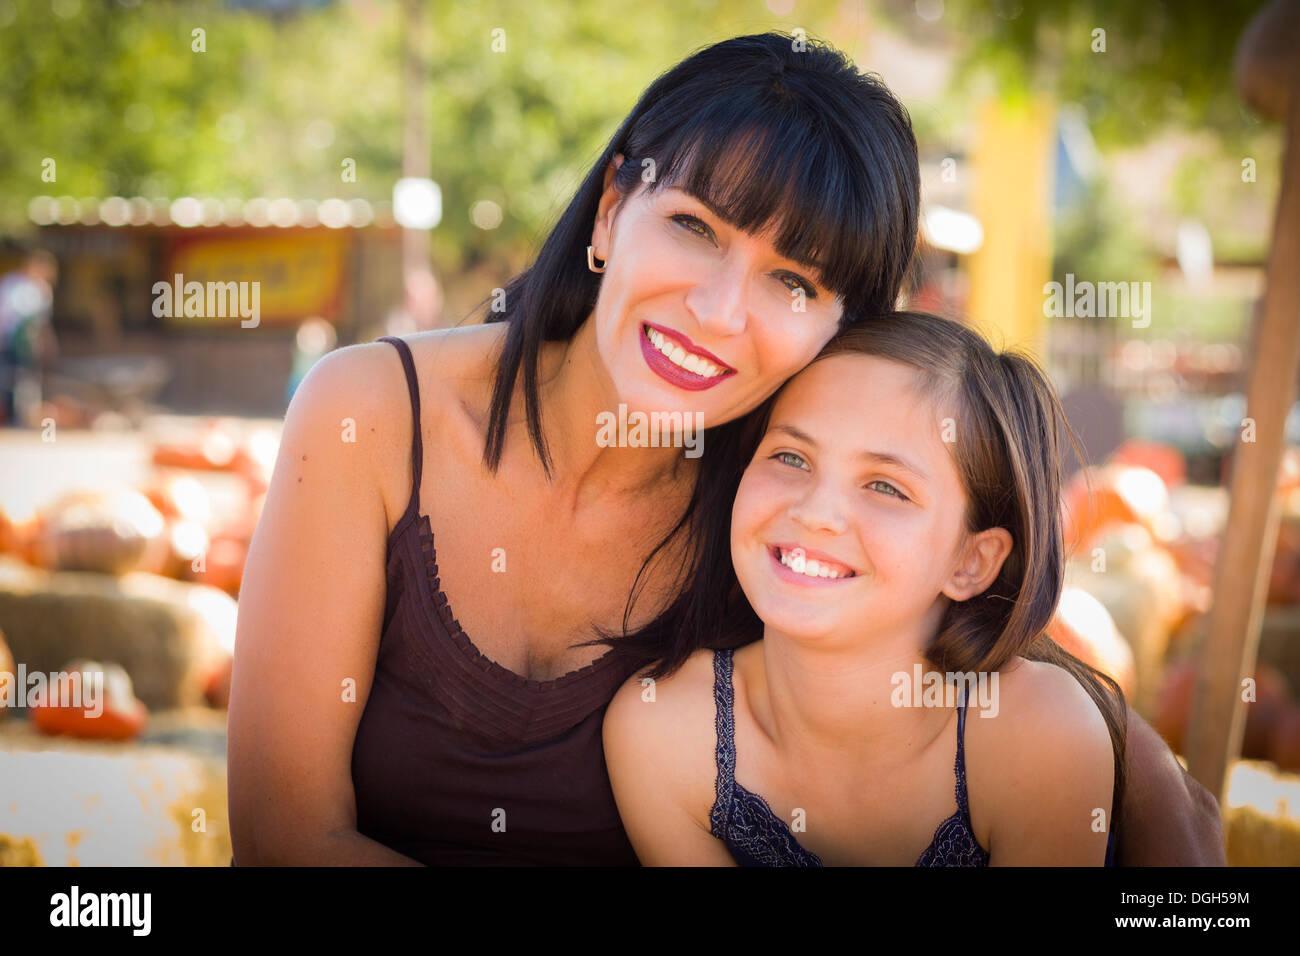 Teen Mom Baby Stockfotos & Teen Mom Baby Bilder - Alamy